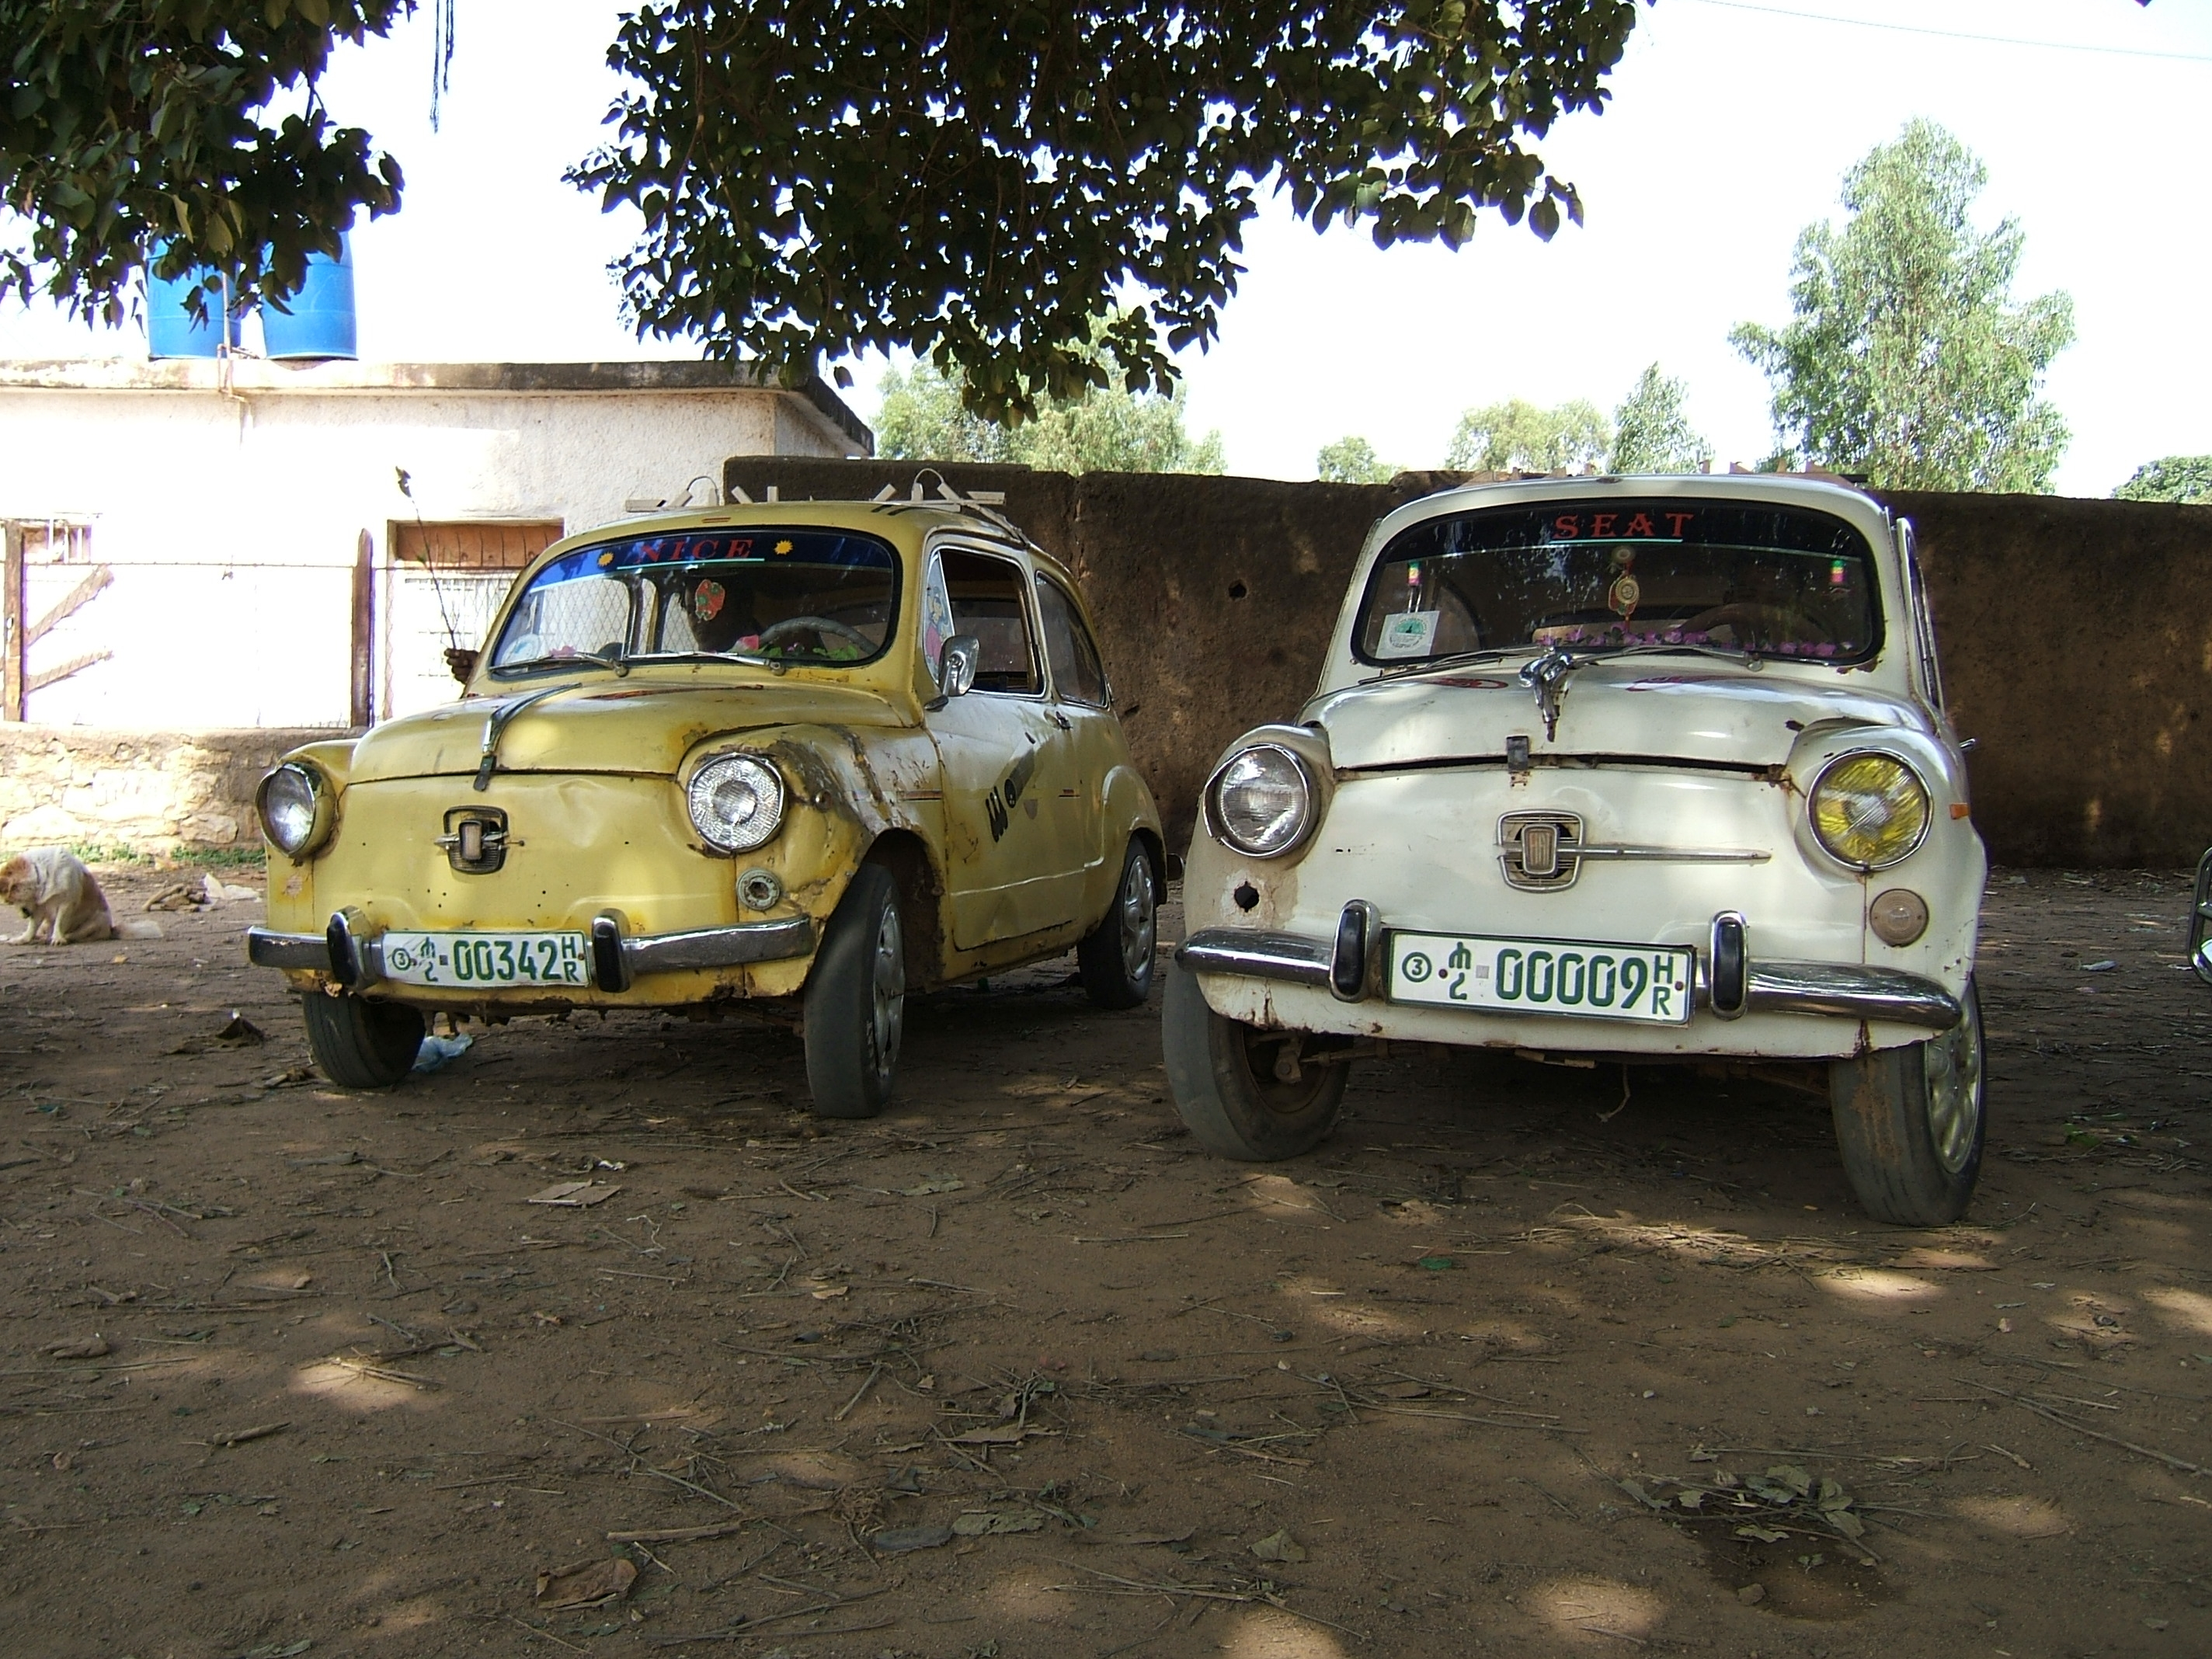 FileTwo Old Fiat Cars In Harer Ethiopiajpg Wikimedia Commons - Www fiat cars